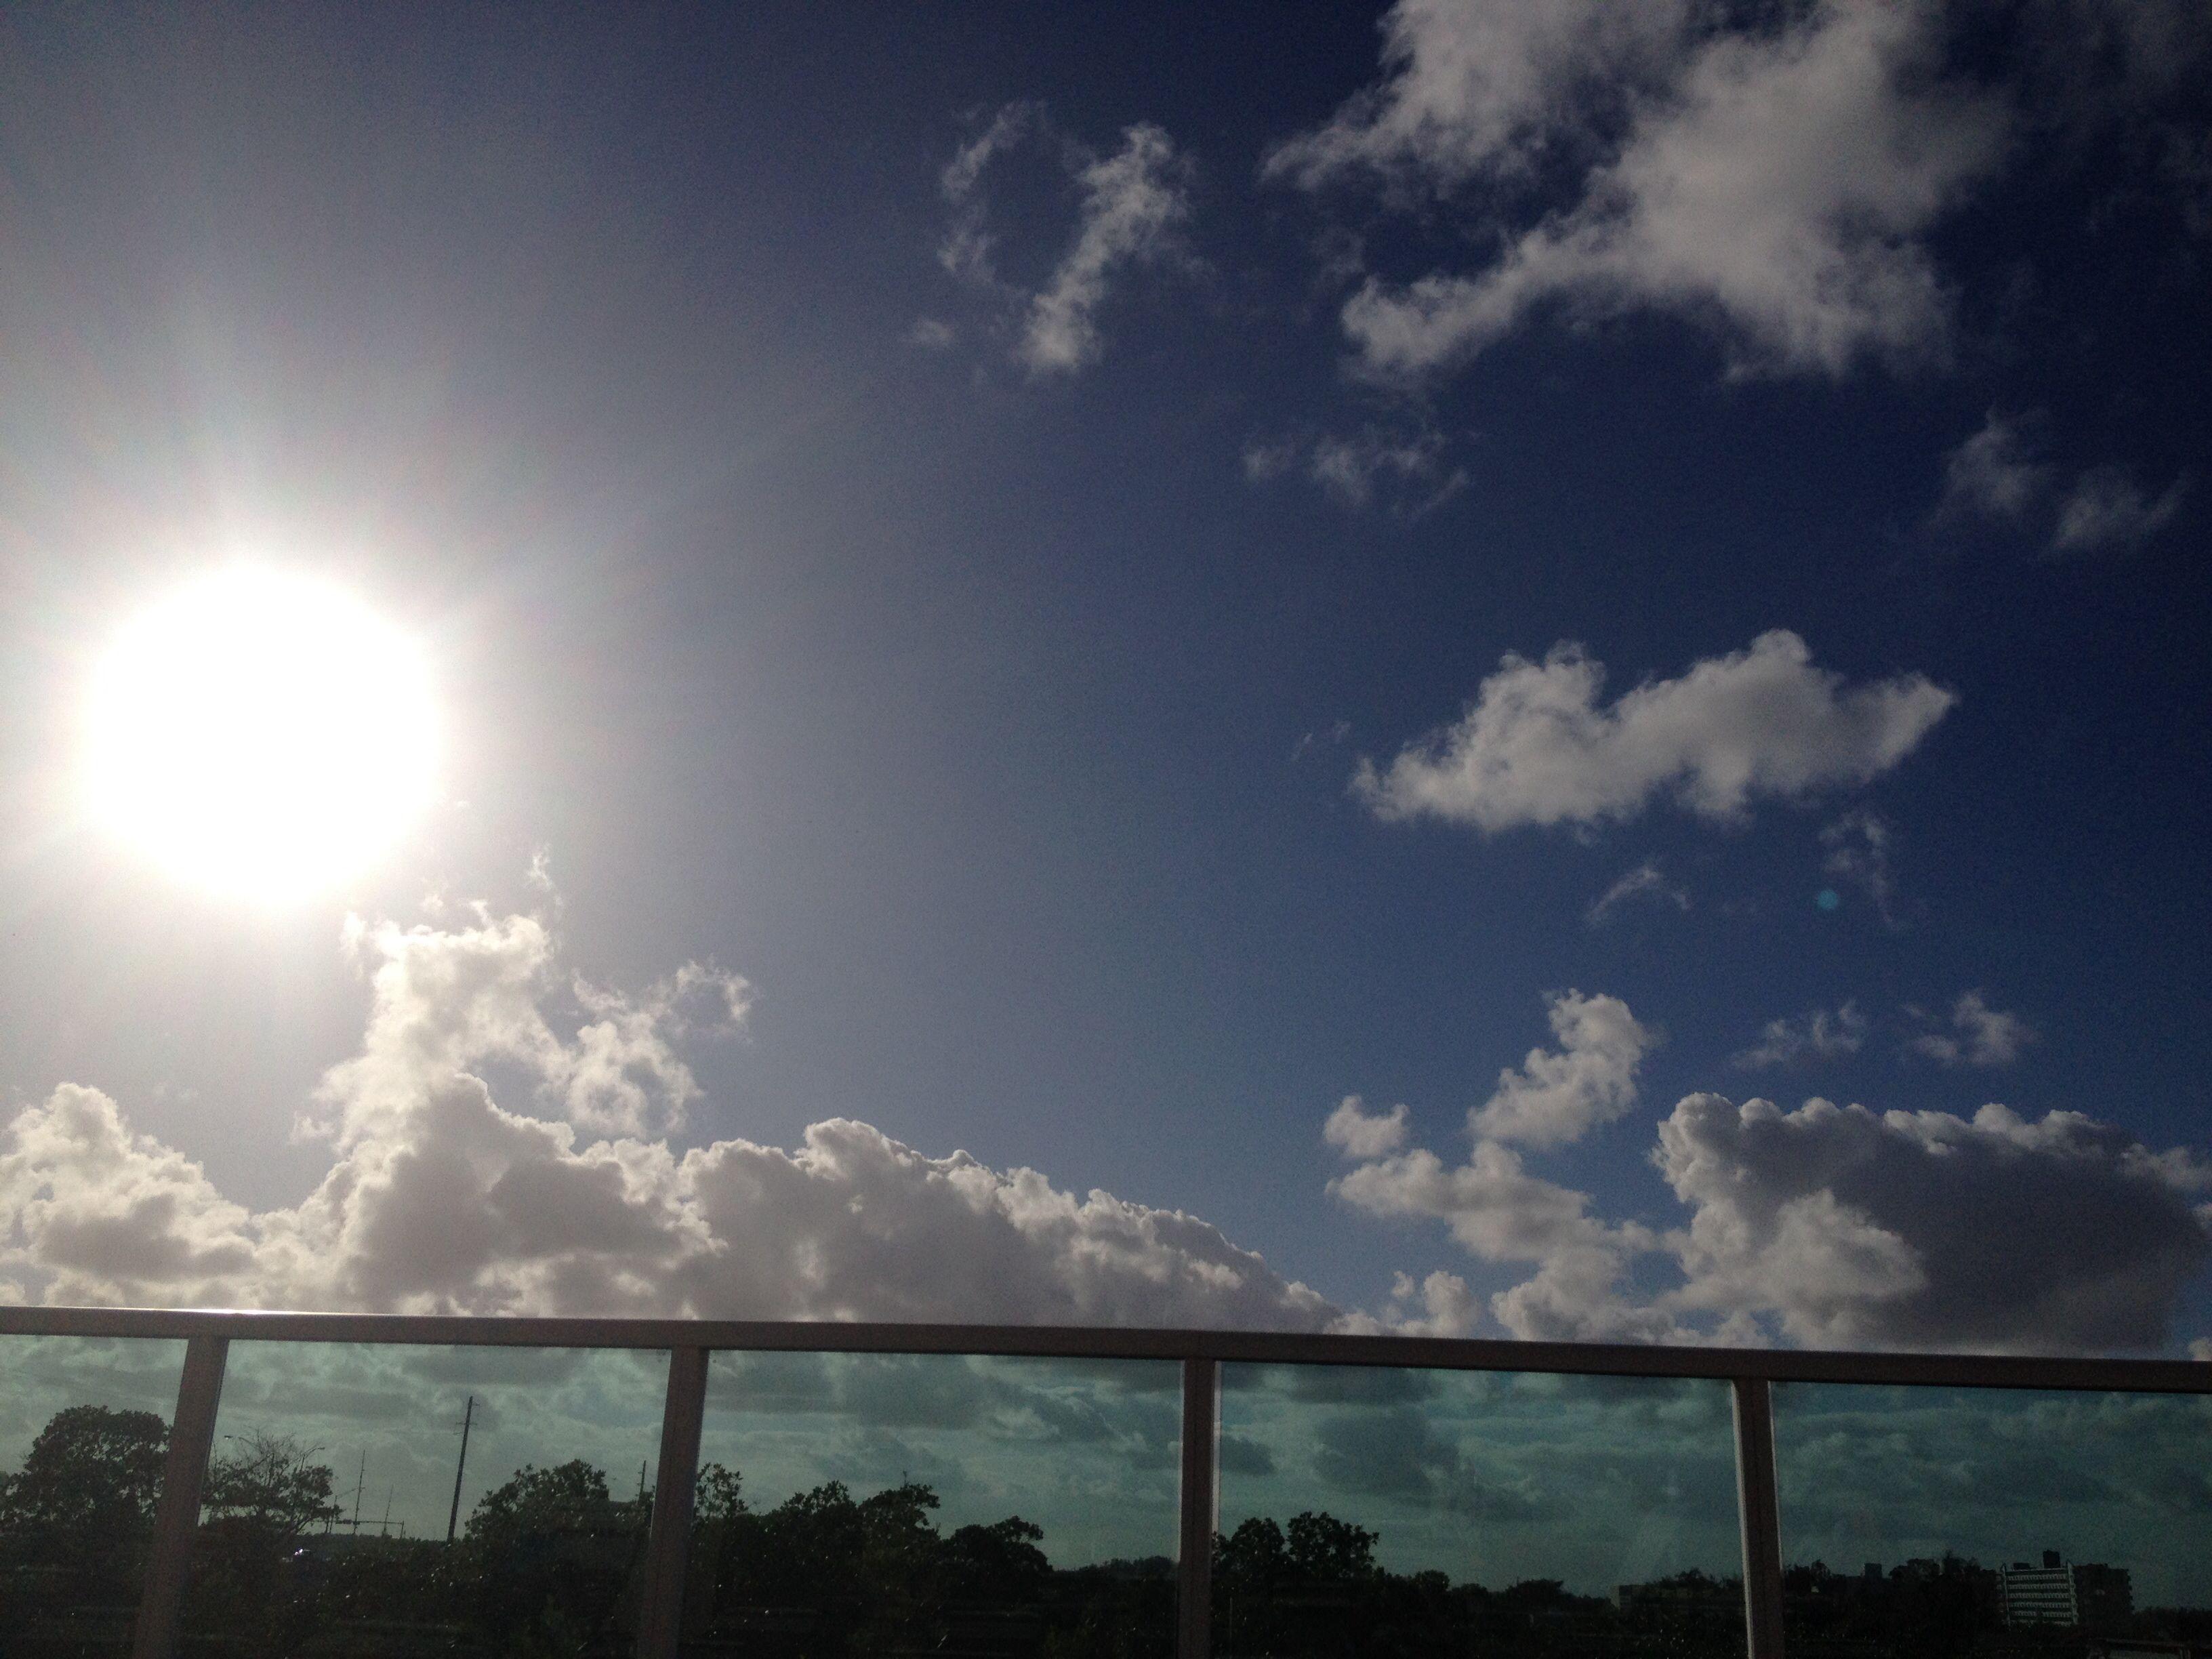 Sunny day in Sunny